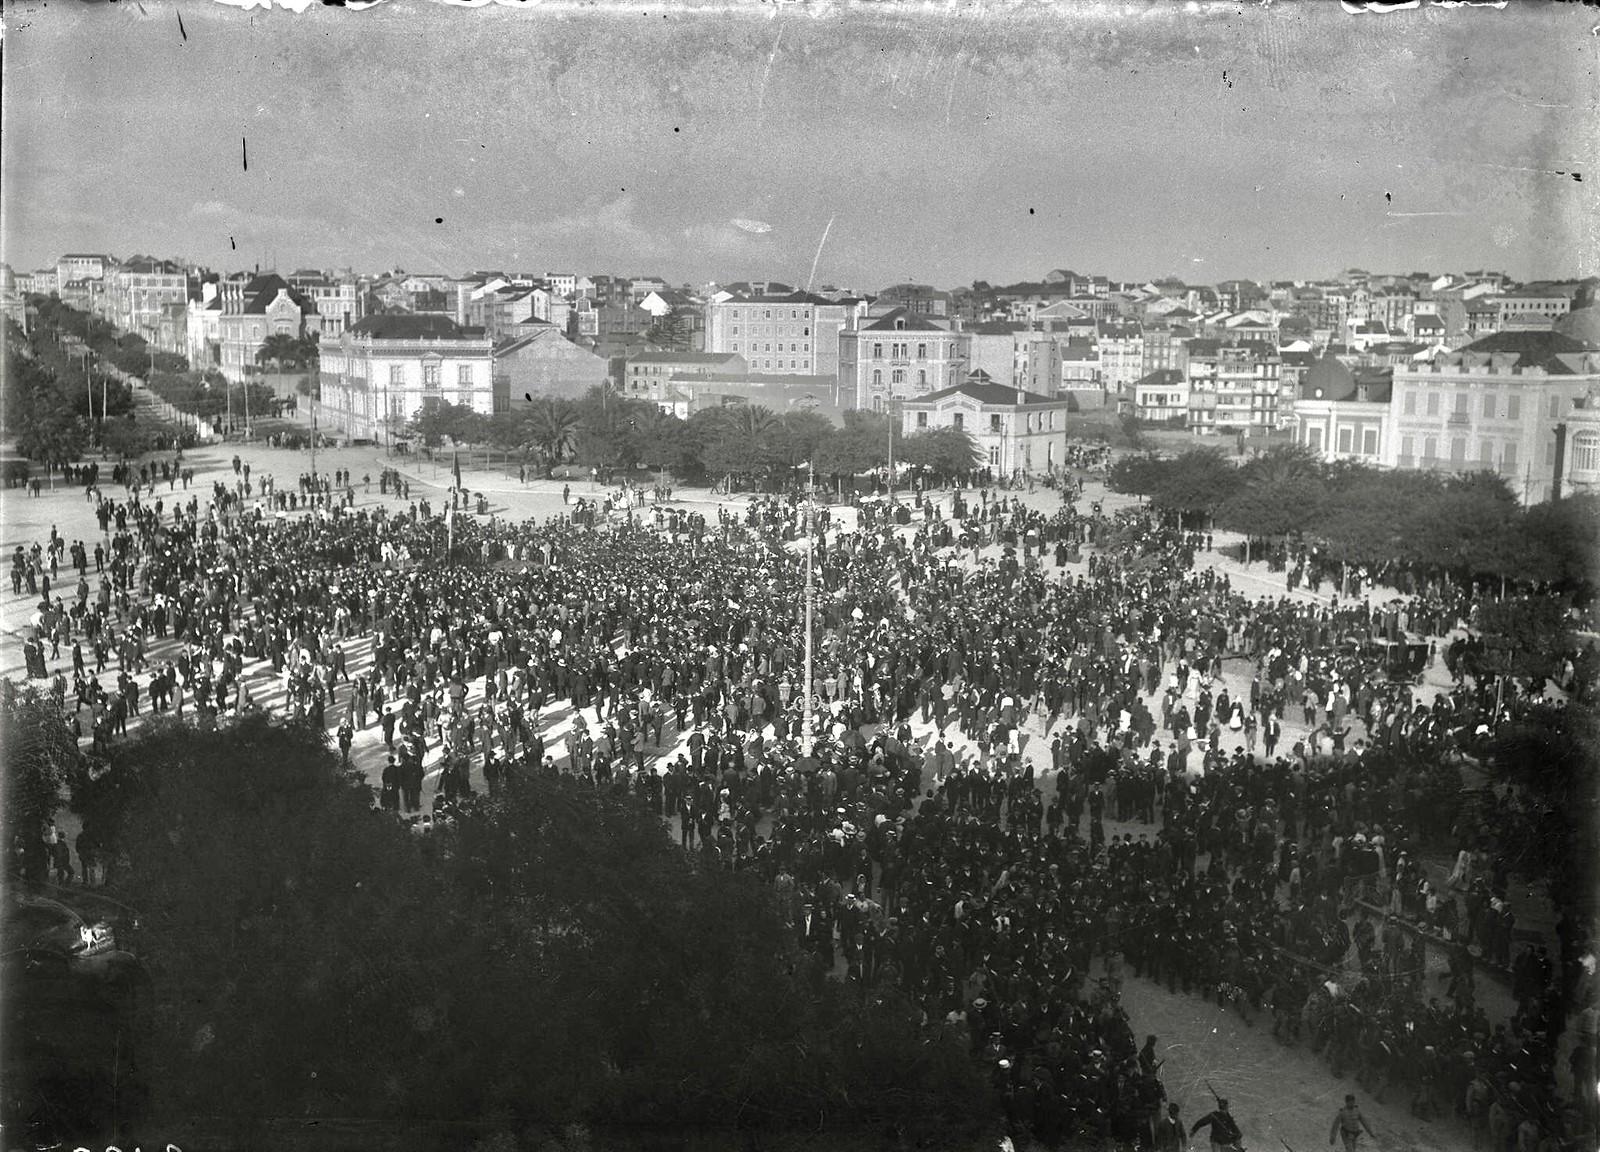 Rotunda, Lisboa (J. Benoliel, 1917)